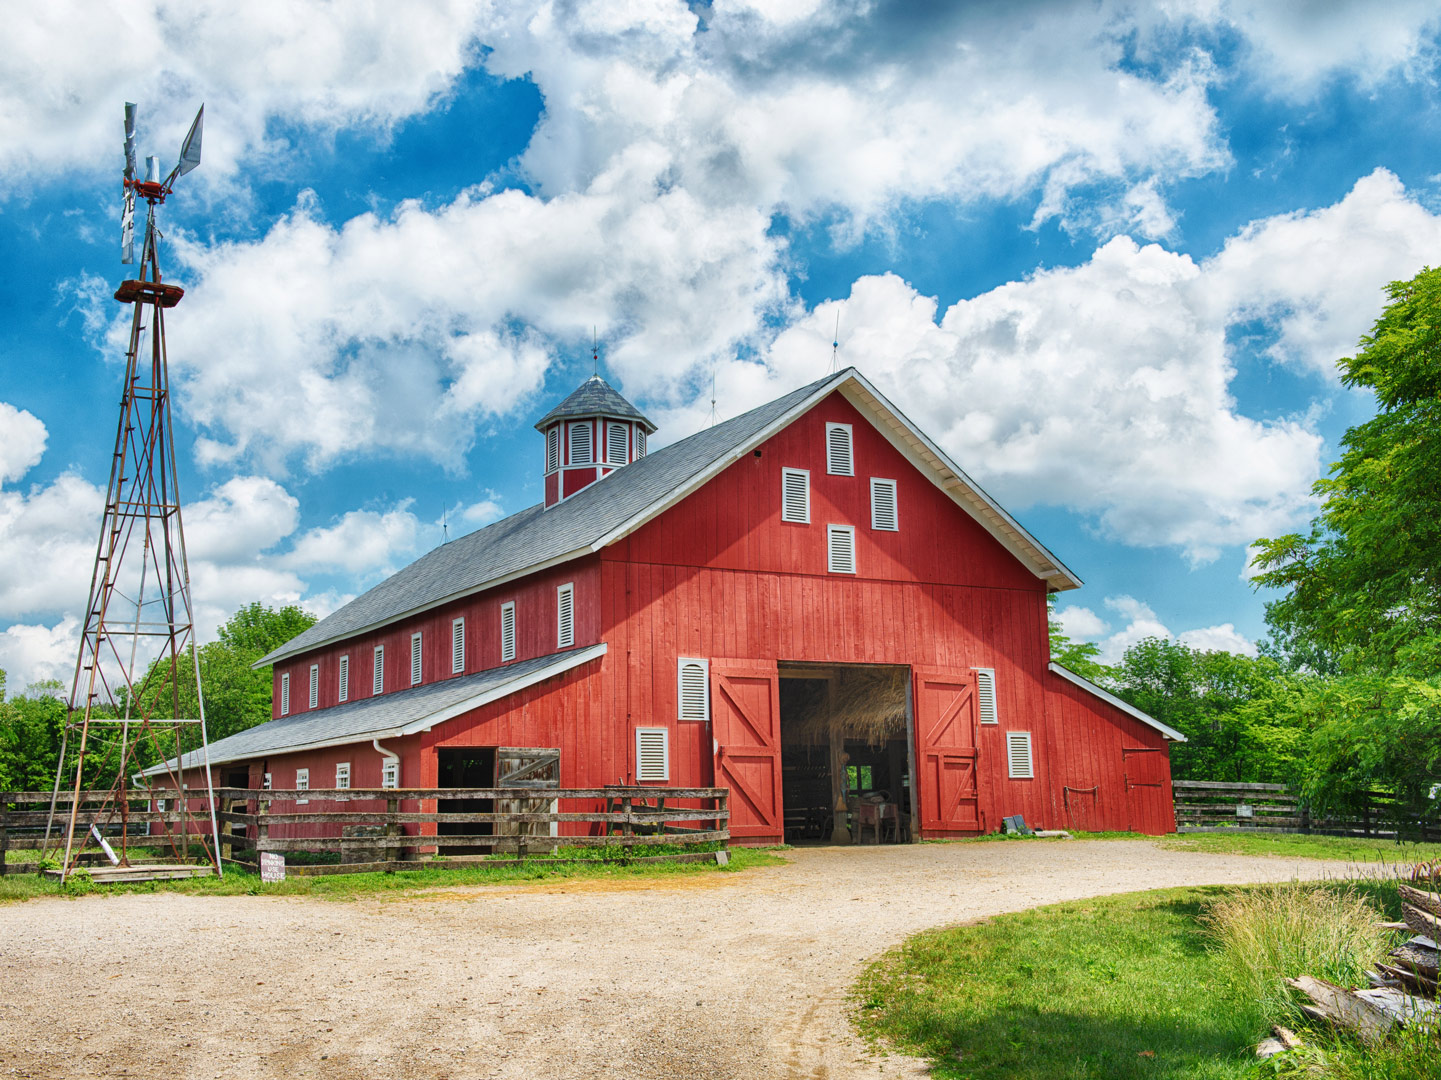 The 19th-century barn at Slate Run Living Historical Farm